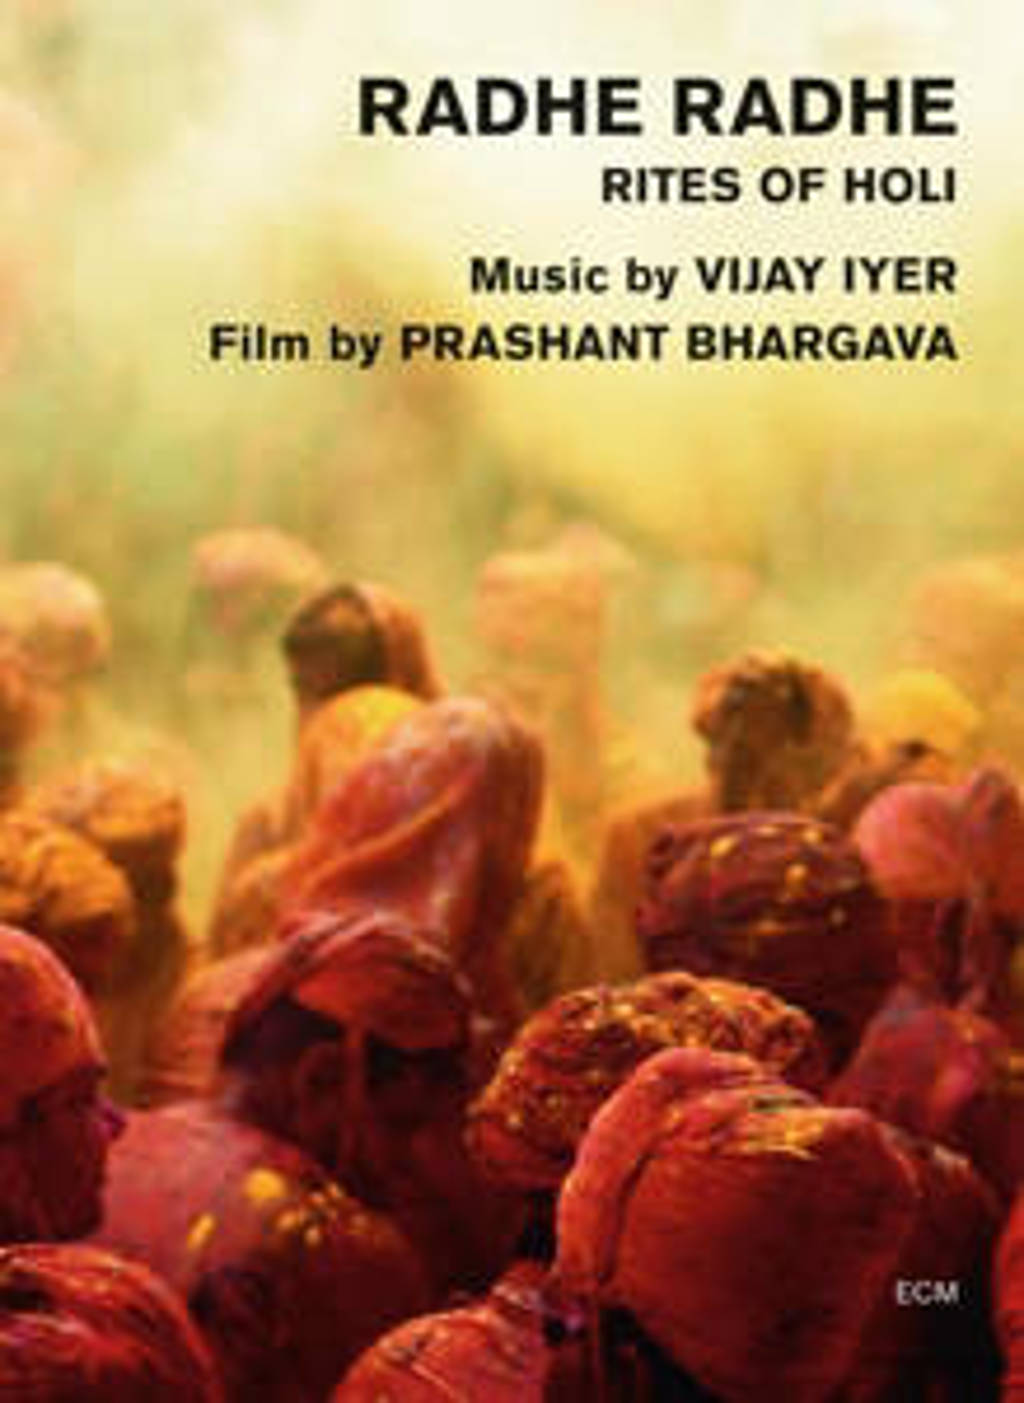 Iyer, Vijay / Bhargava, Prashant - Radhe Radhe - Rites Of Holi (Blu-ray)